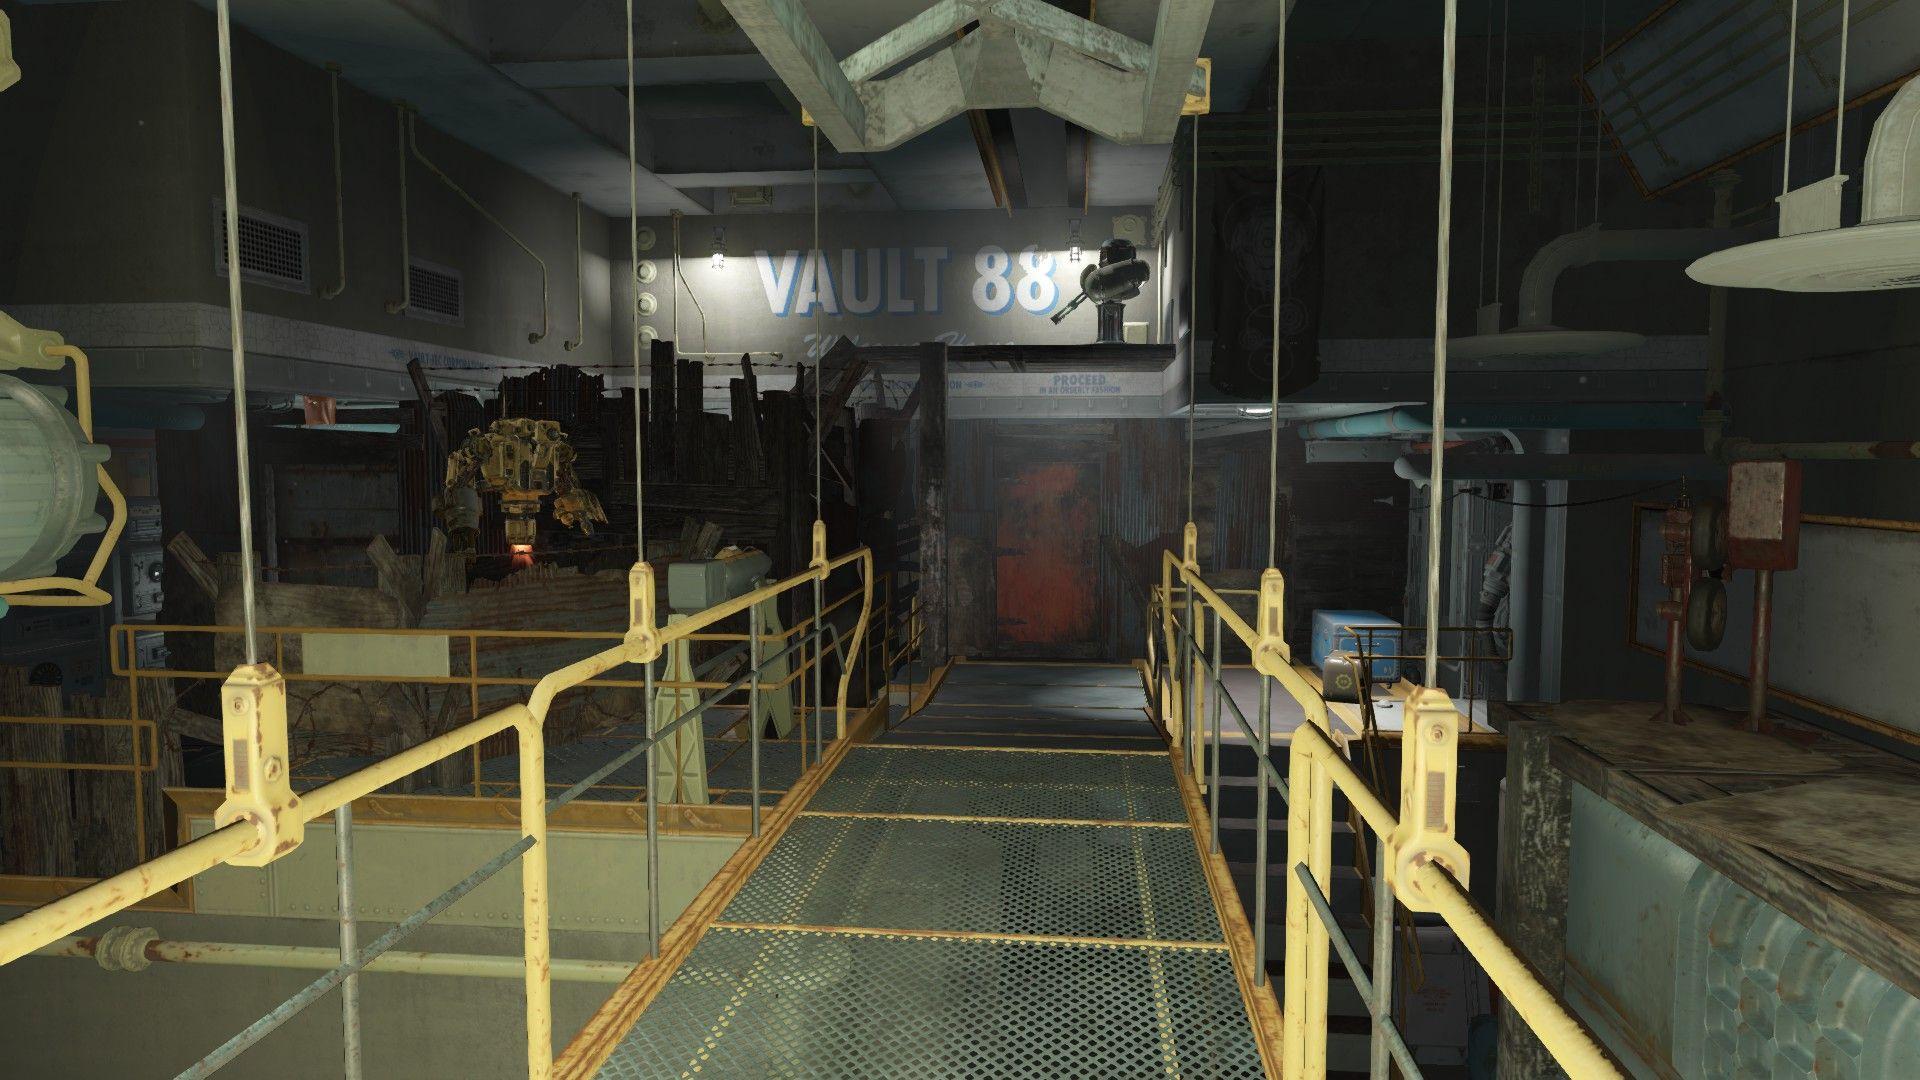 Vault 88 Raider Settlement (No mods) #Fallout4 #gaming #Fallout